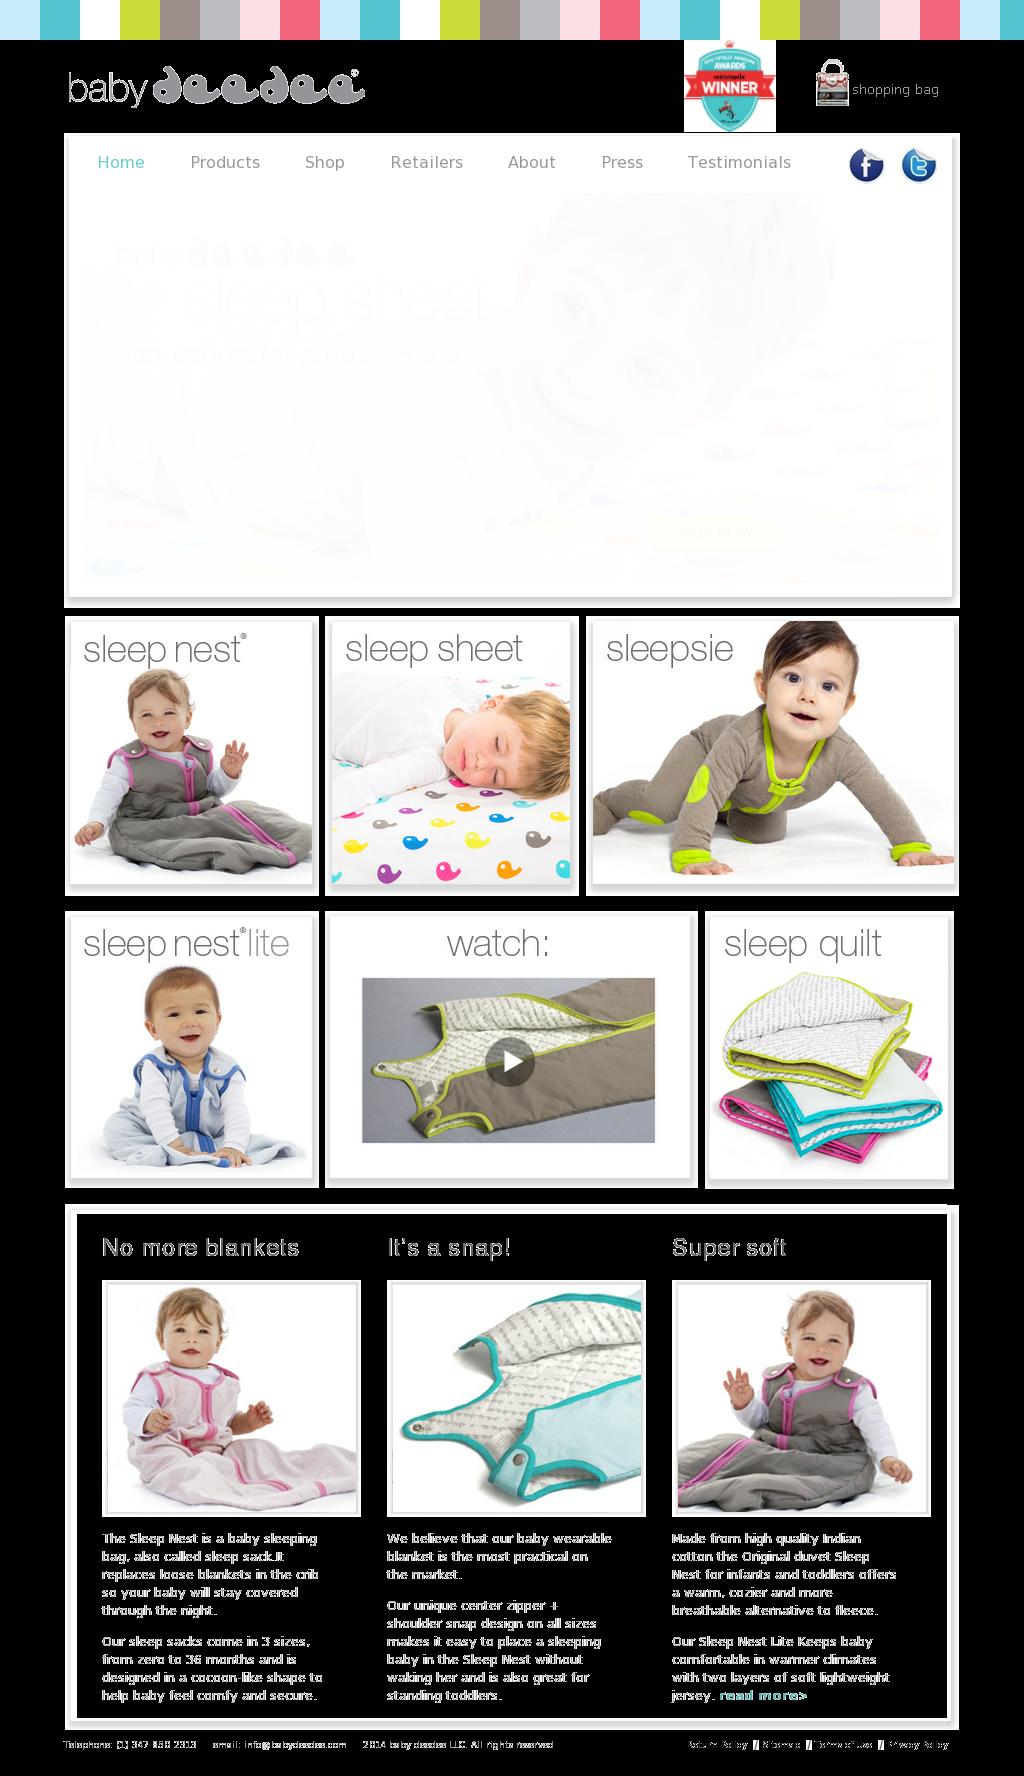 Baby deedee Competitors, Revenue and Employees - Owler